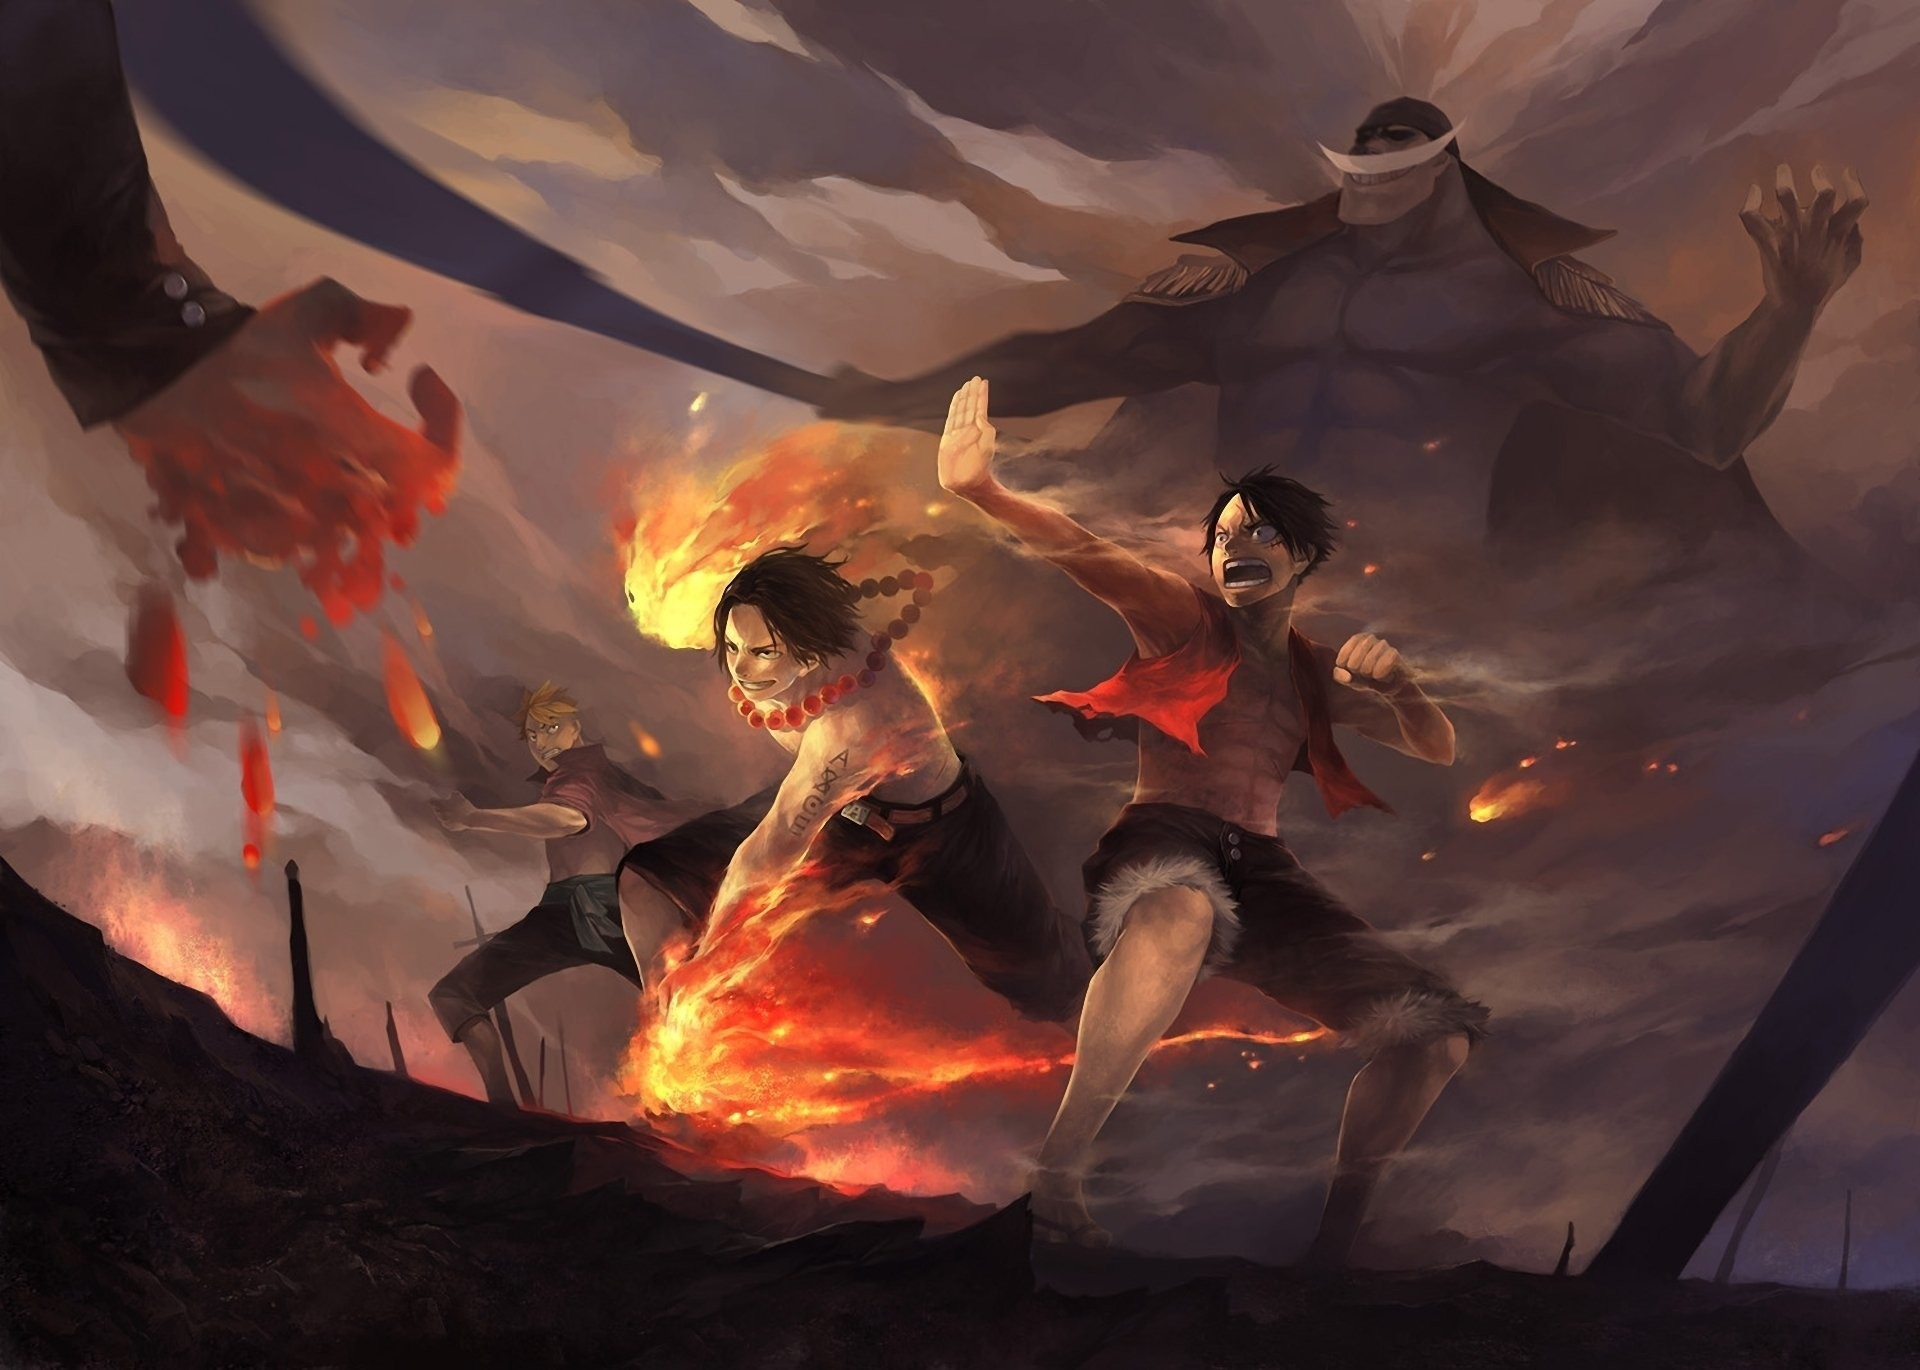 One Piece Santoryu Zoro Roronoa · HD Wallpaper | Hintergrund ID:174965